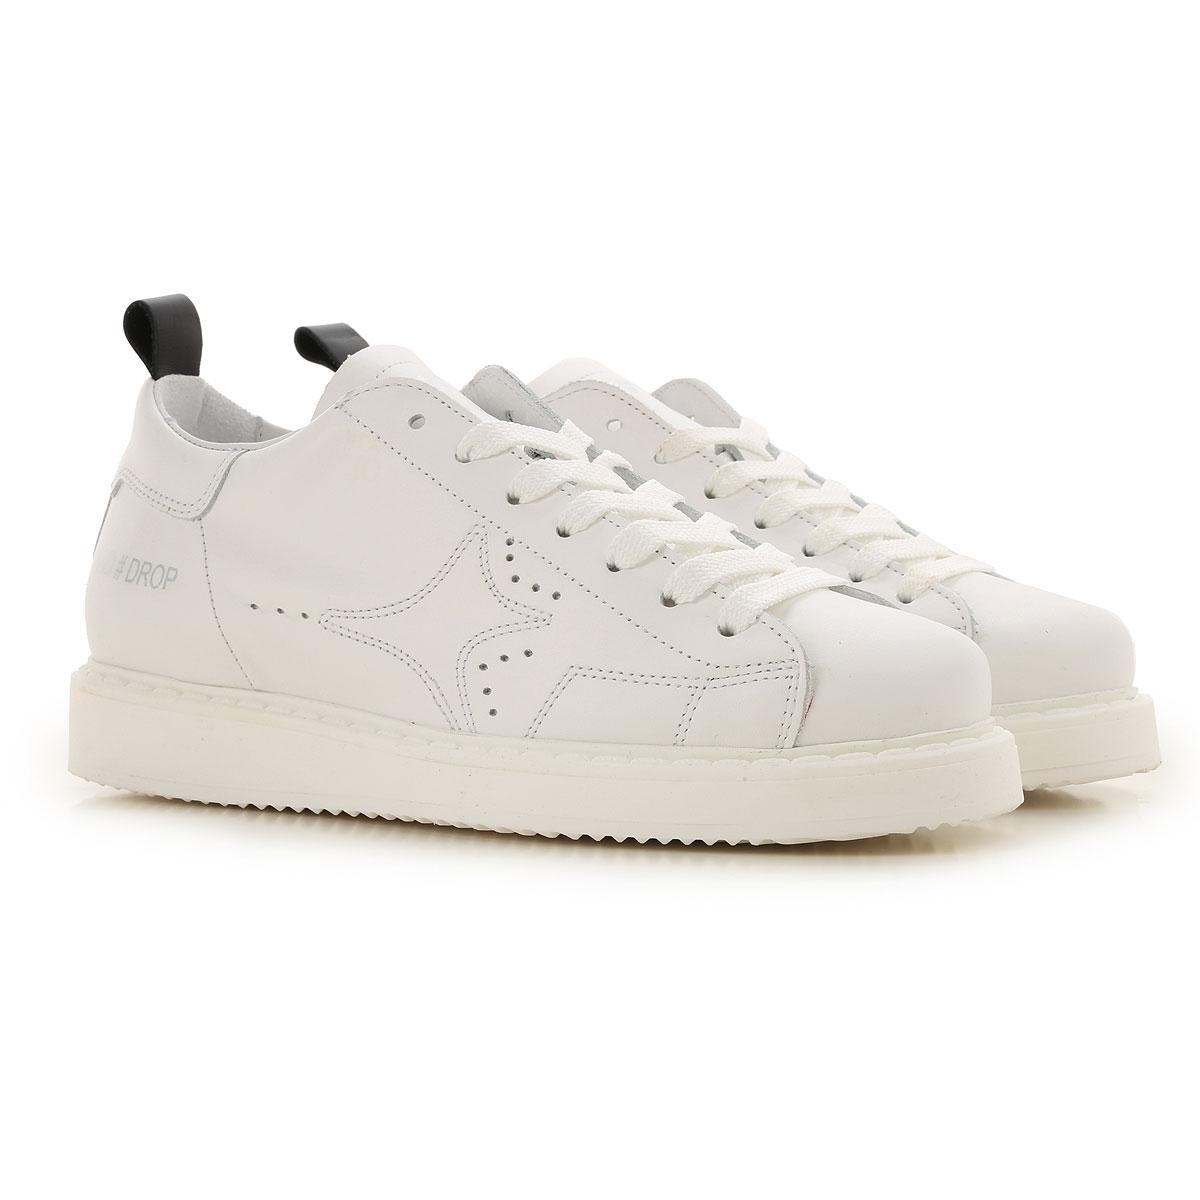 Ama Brand Sneaker Femme, Blanc, Cuir, 2017, 36 37 38 40